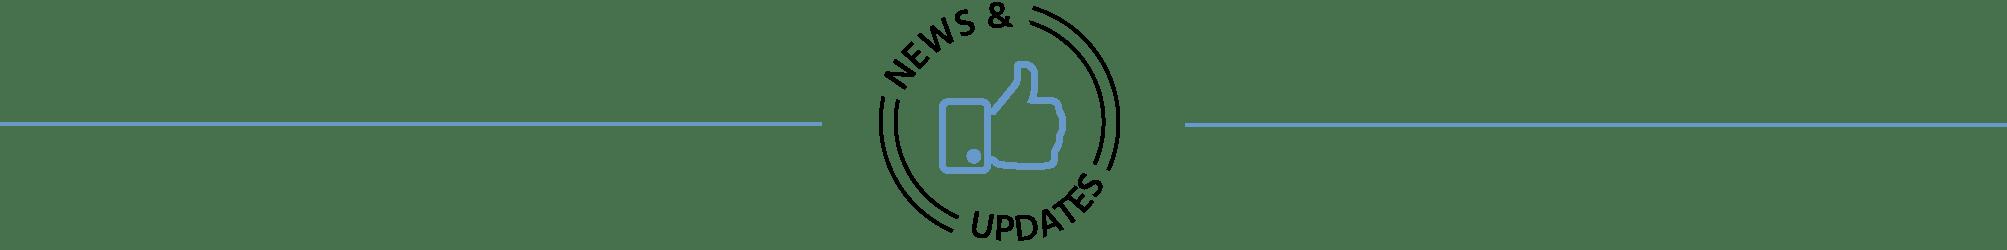 news updates horizontal rule